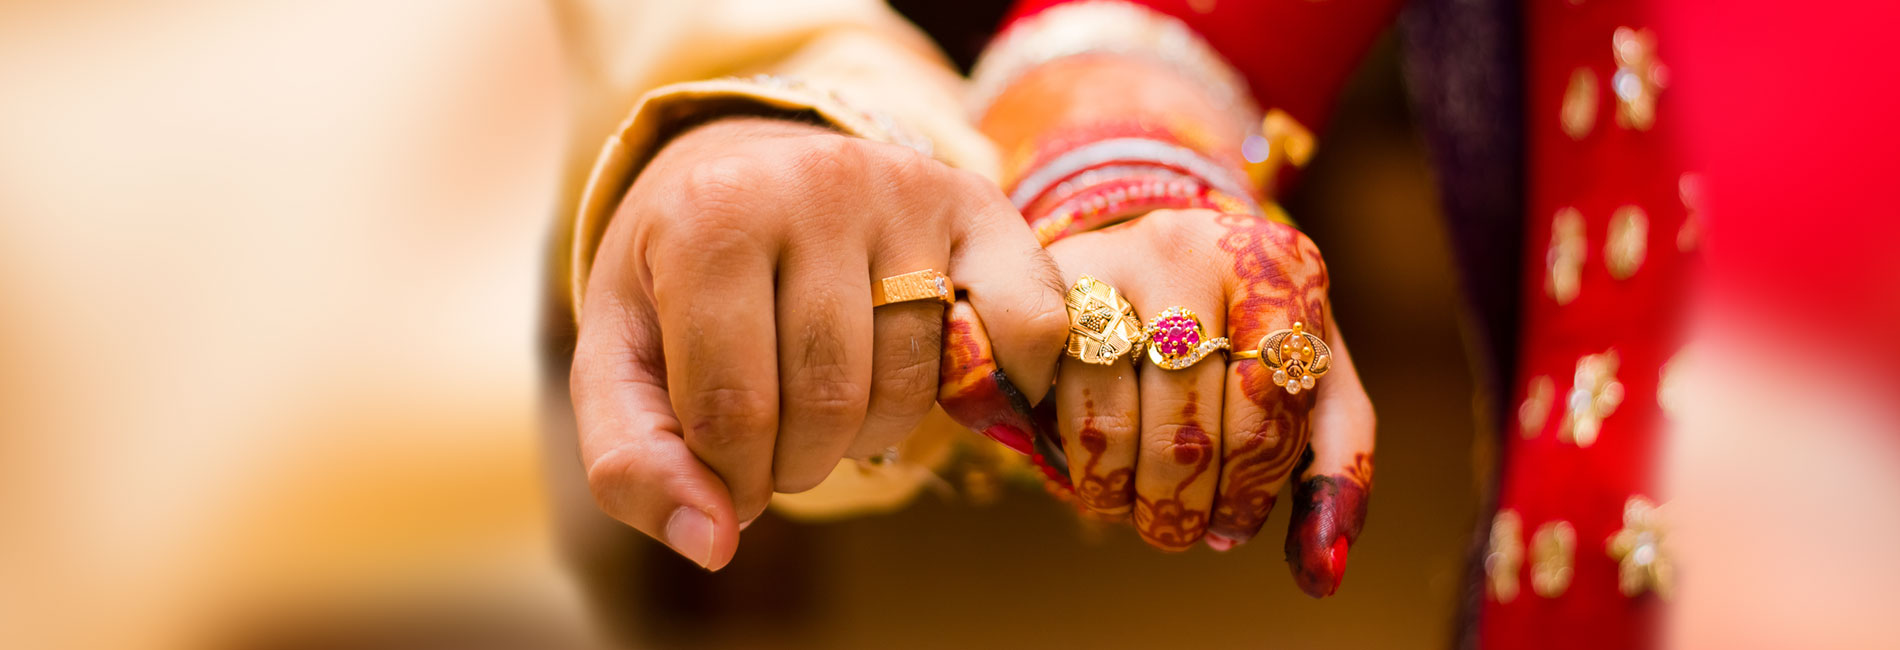 PunjabKesari, Love marraige, marriage